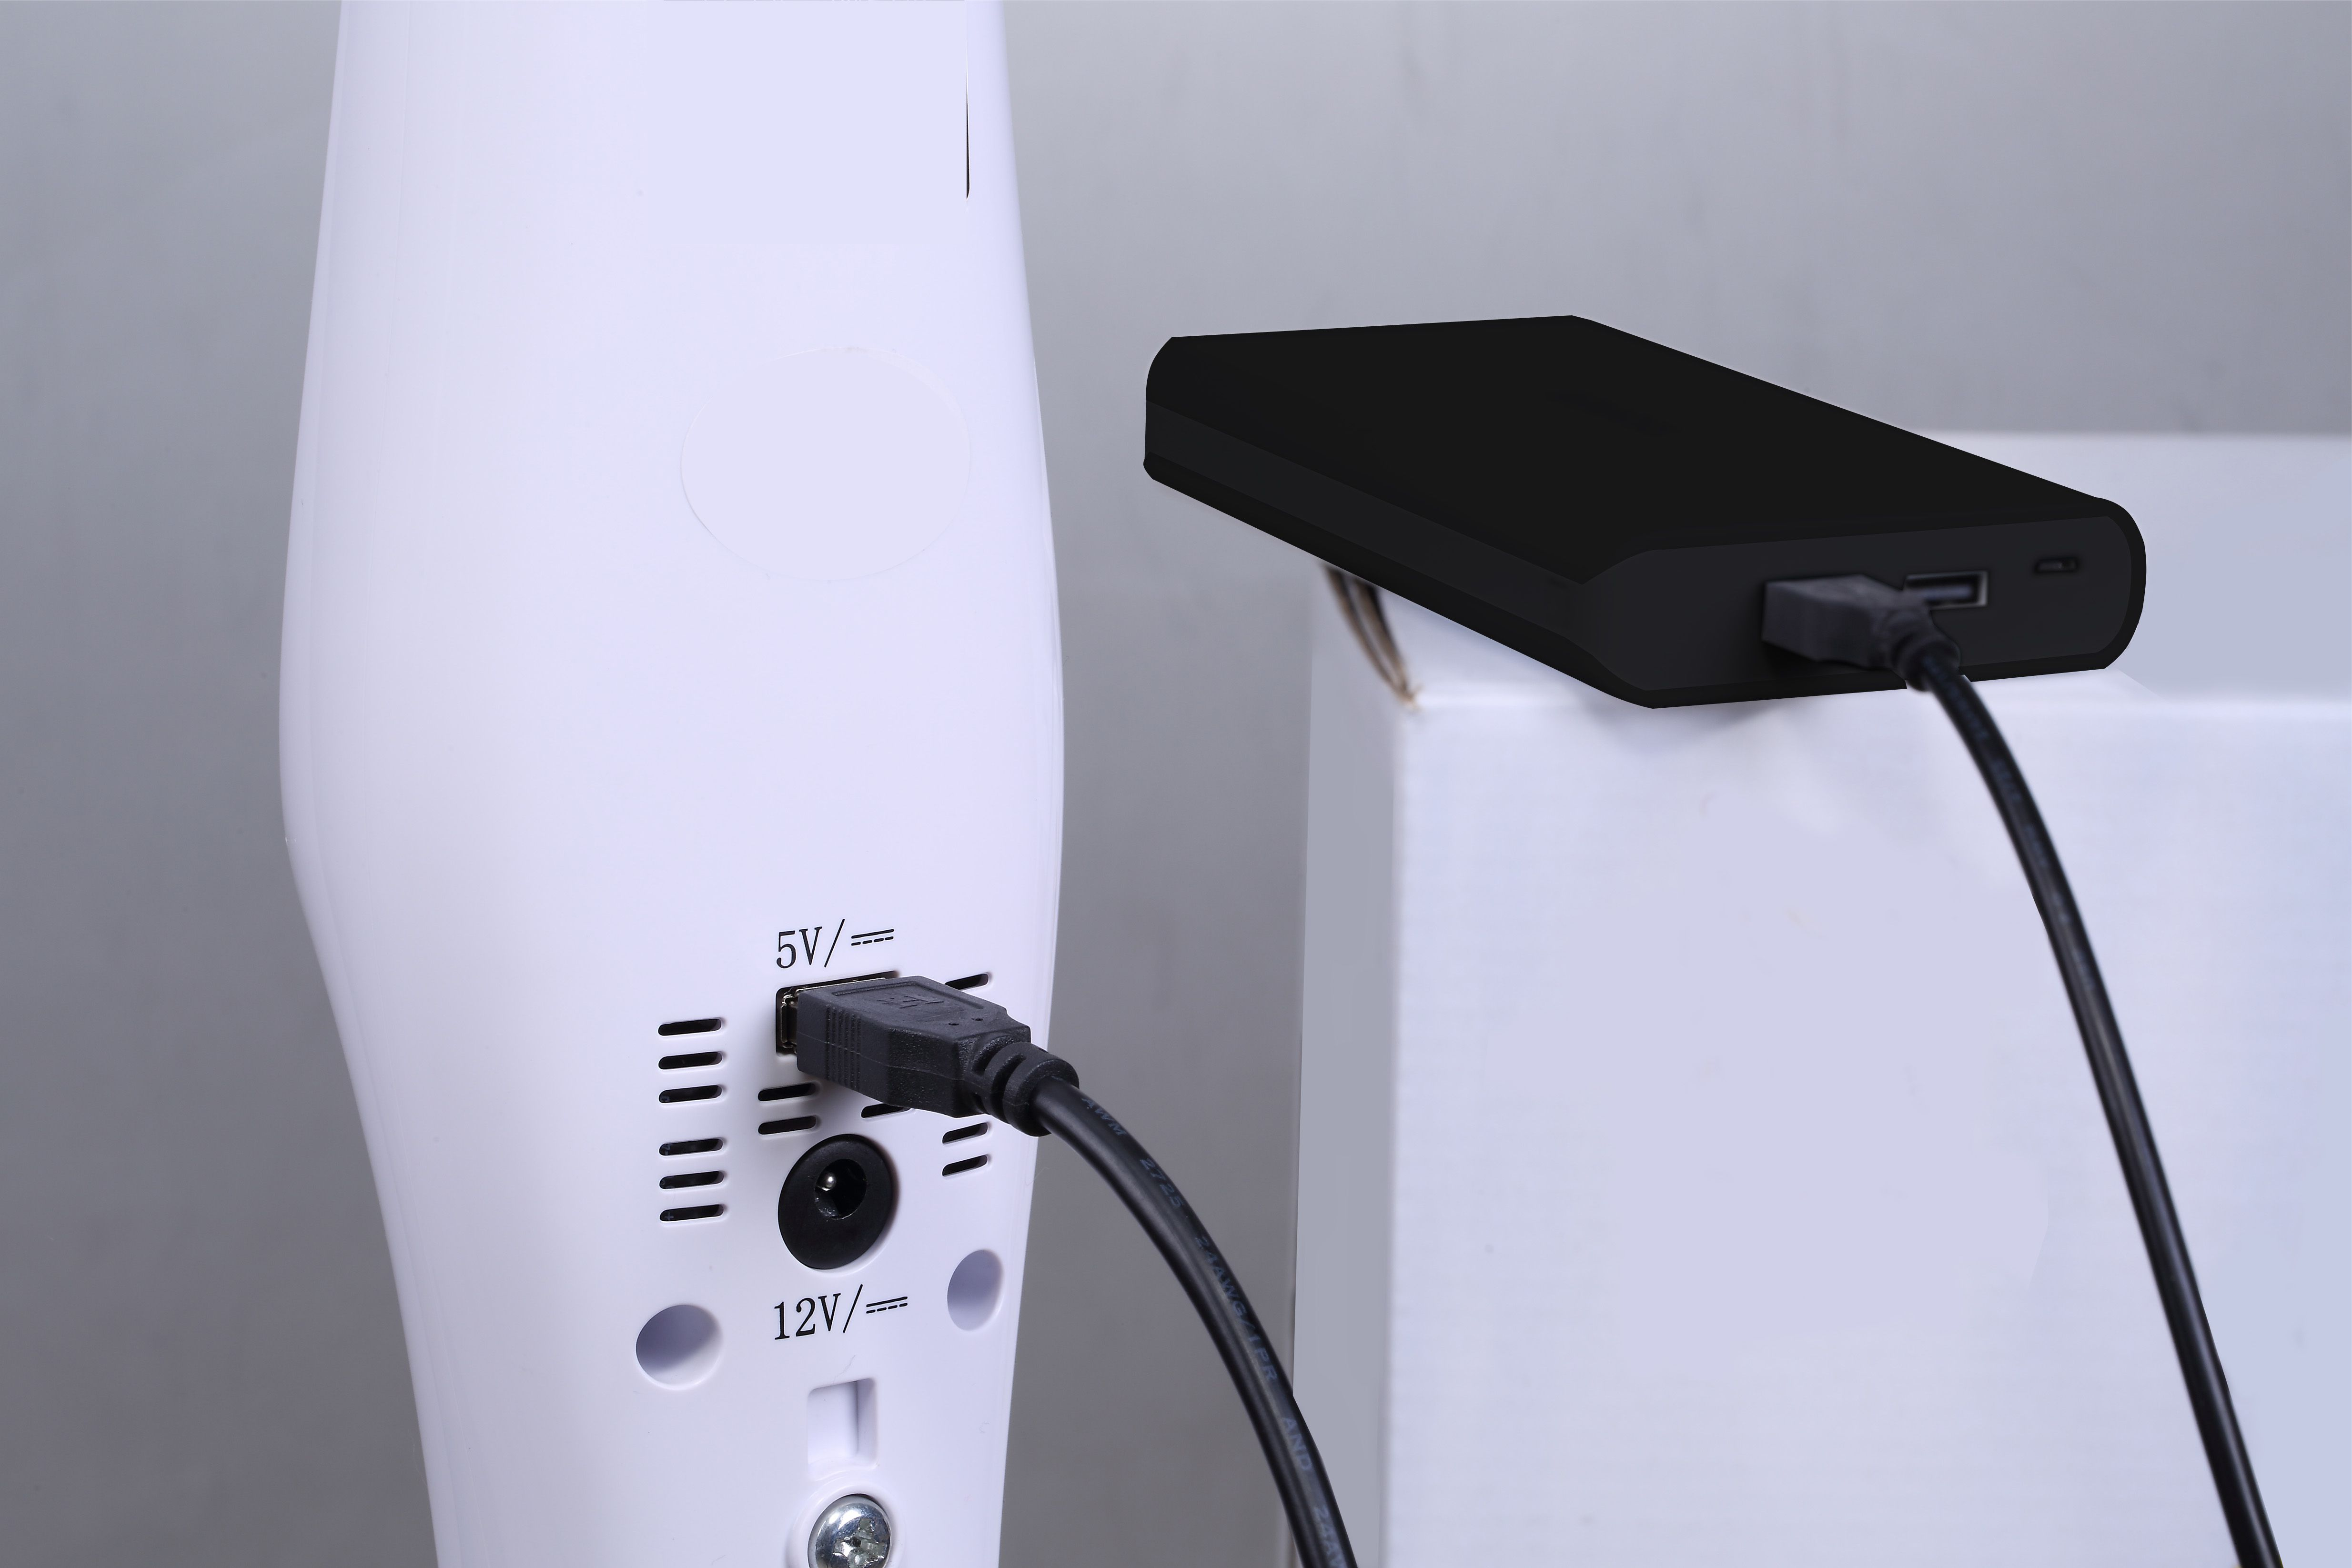 deko akku stand ventilator silence stratos b450 akku ventilatoren deko design. Black Bedroom Furniture Sets. Home Design Ideas